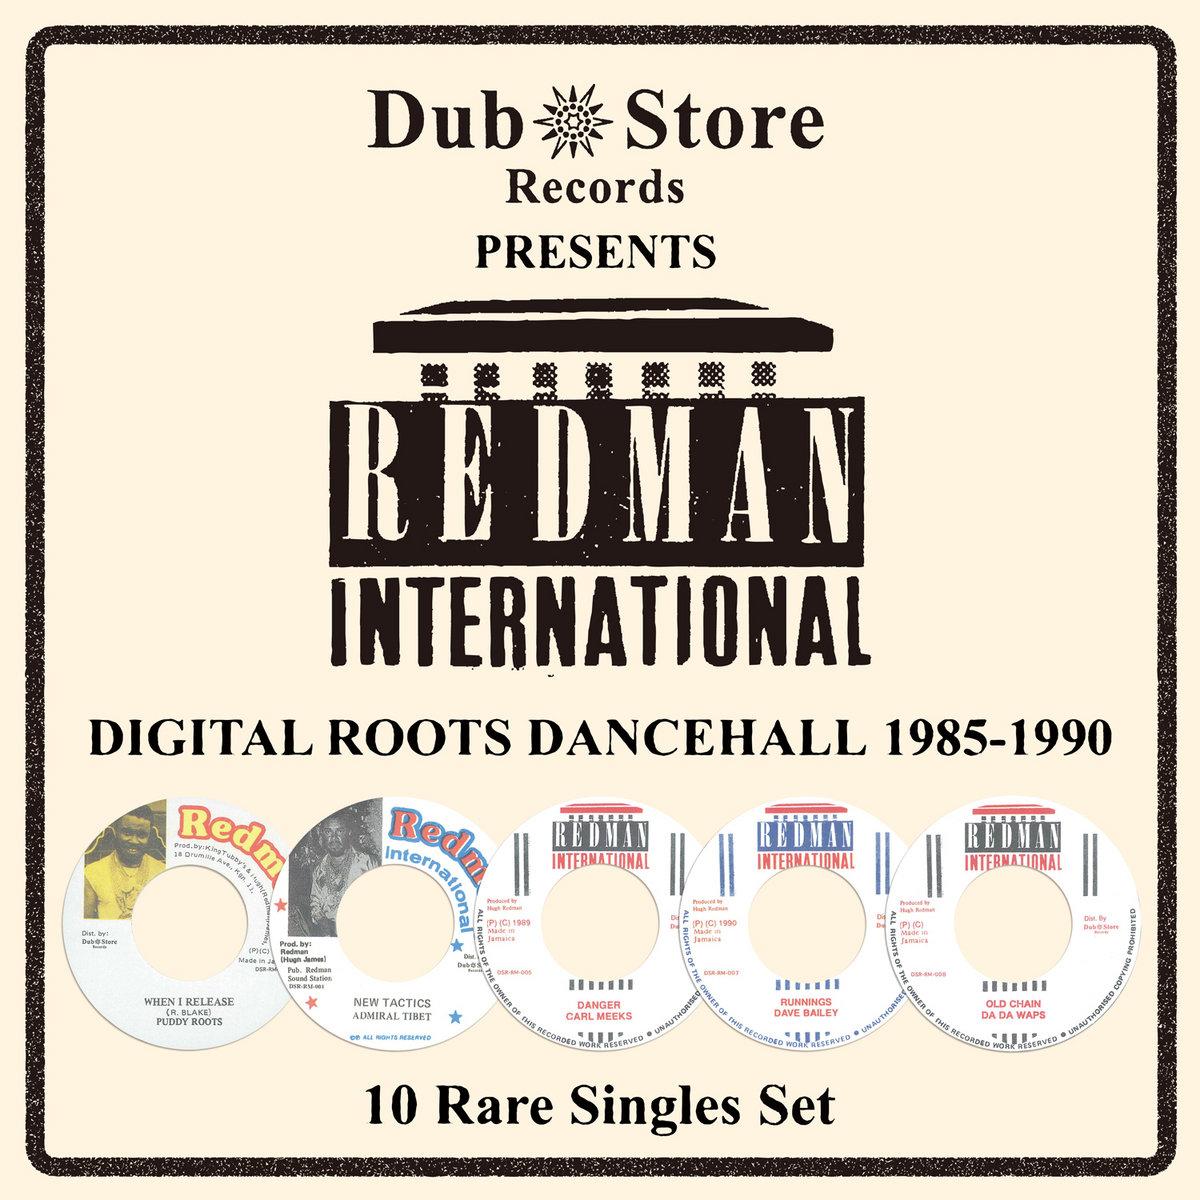 Redman International: Digital Roots Dancehall 1985 to 1990 - 10 Rare